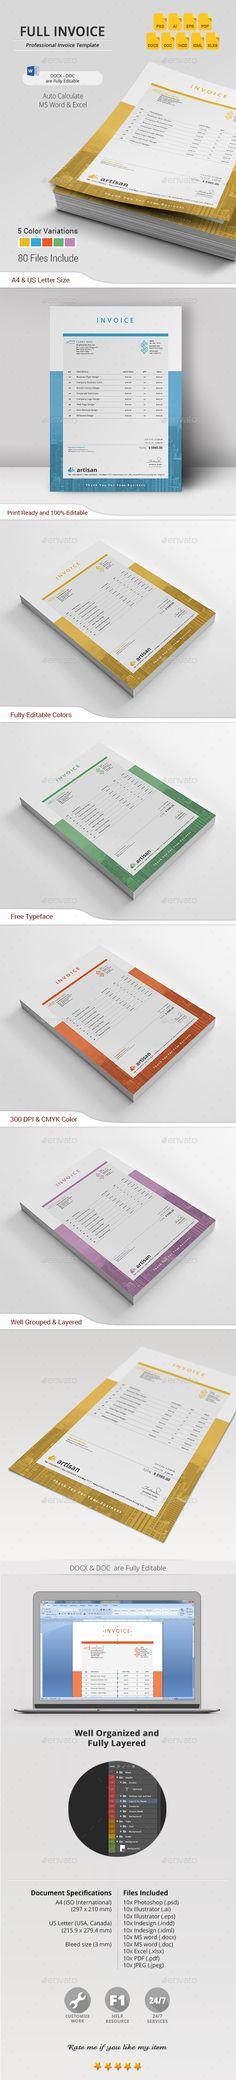 Invoice Template PSD, AI, EPS, INDD, IDML, DOCX, DOC & XLSX